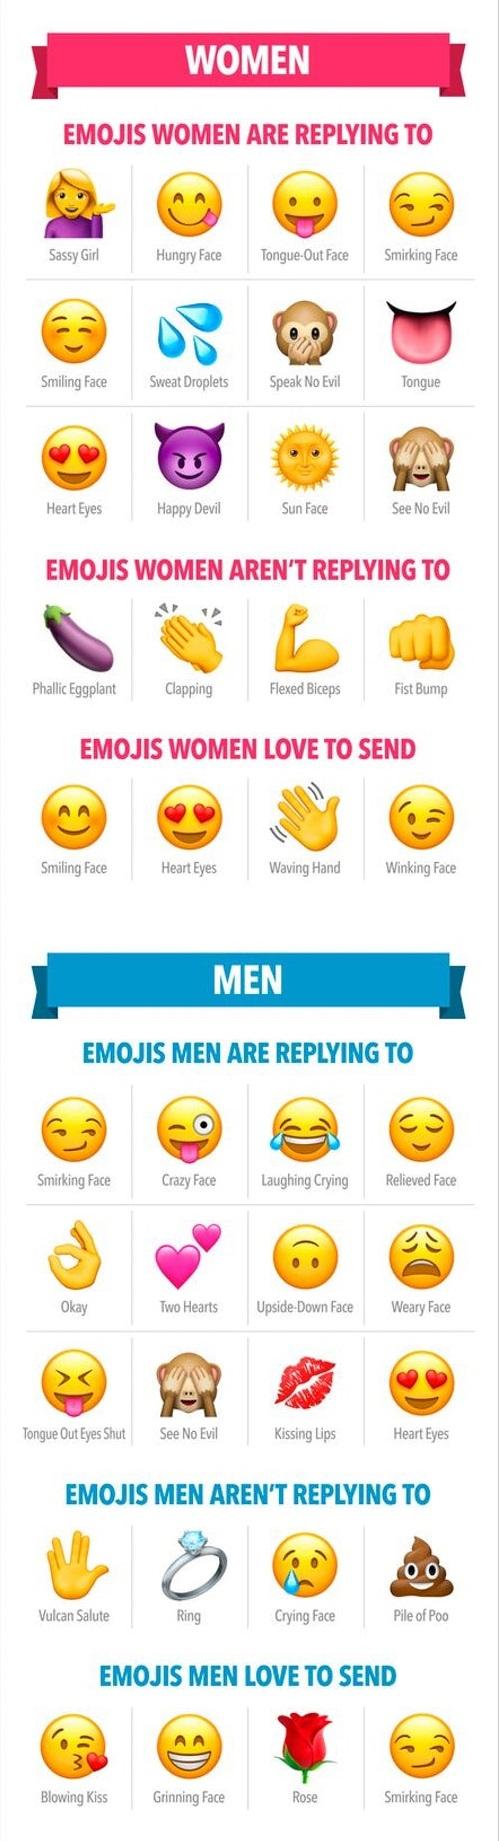 emojis for men and women